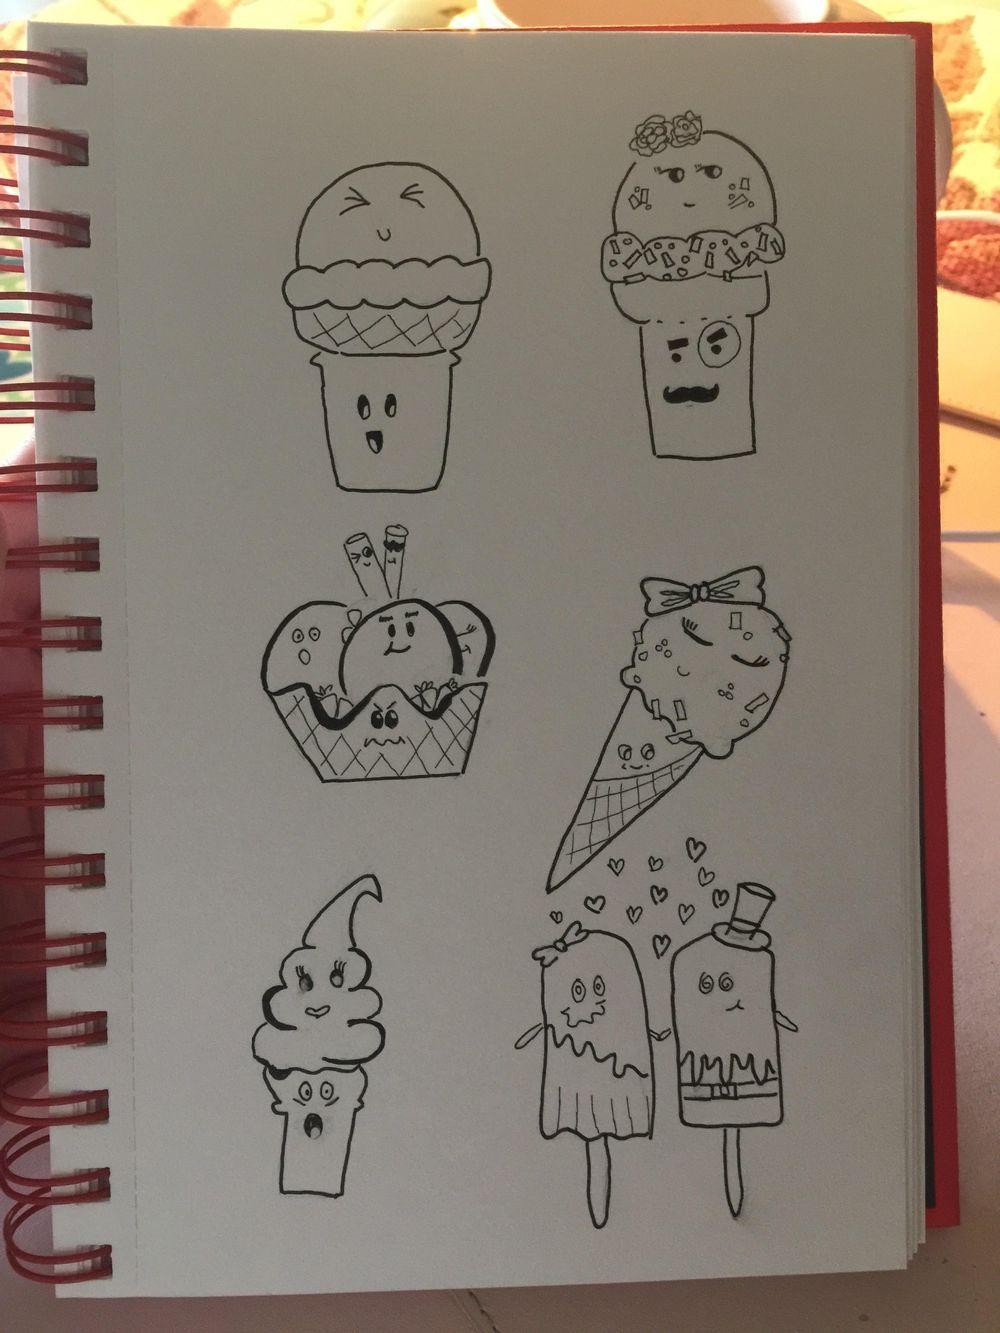 Ice cream ! - image 1 - student project